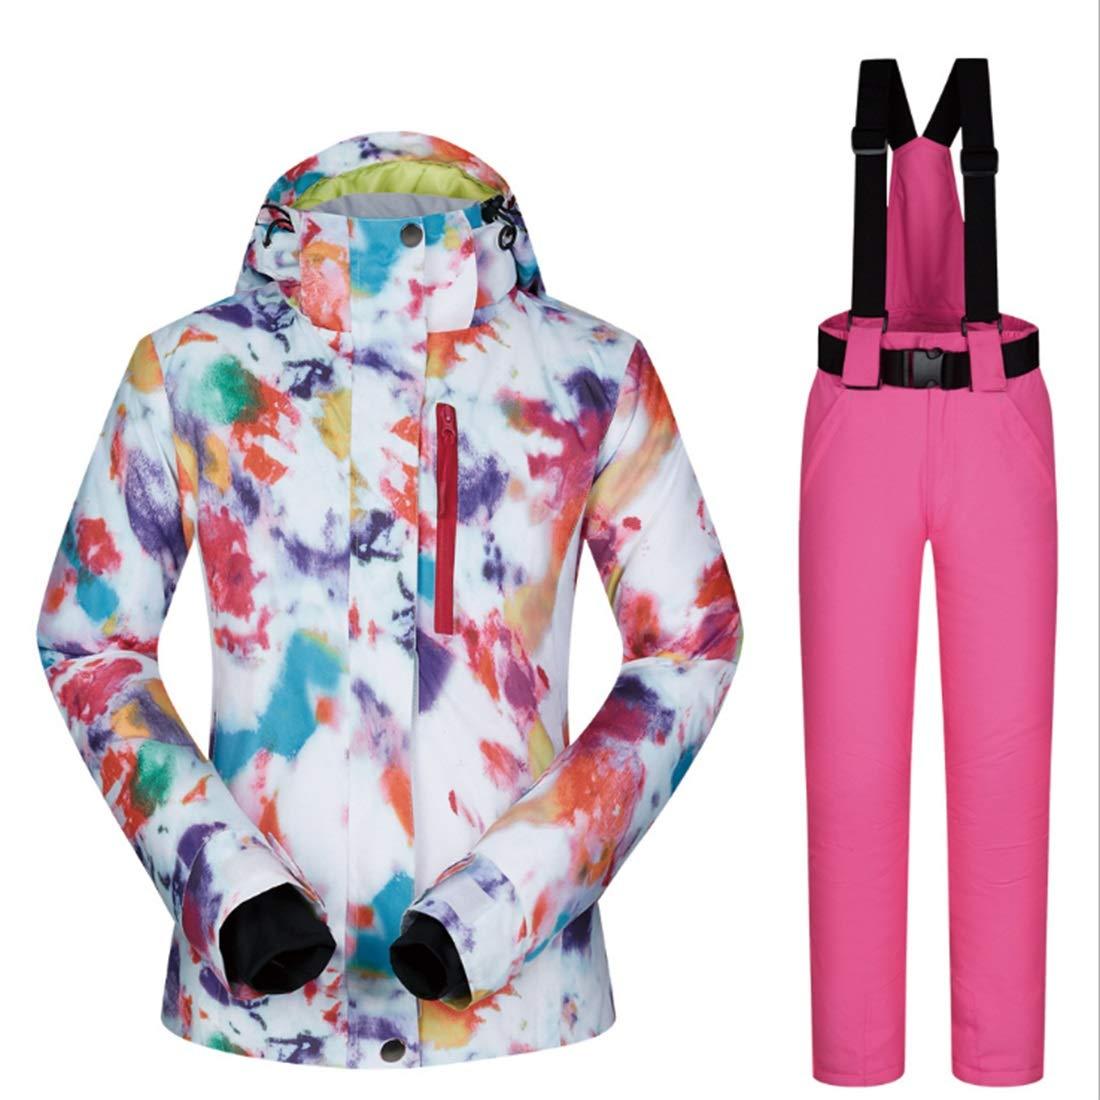 Ovesuxl - Tuta da Sci e Pantaloni Donna, da Donna, Pantaloni Antivento e Impermeabile, 03, LargeB07KRZG3N2Large 05 c74ce5